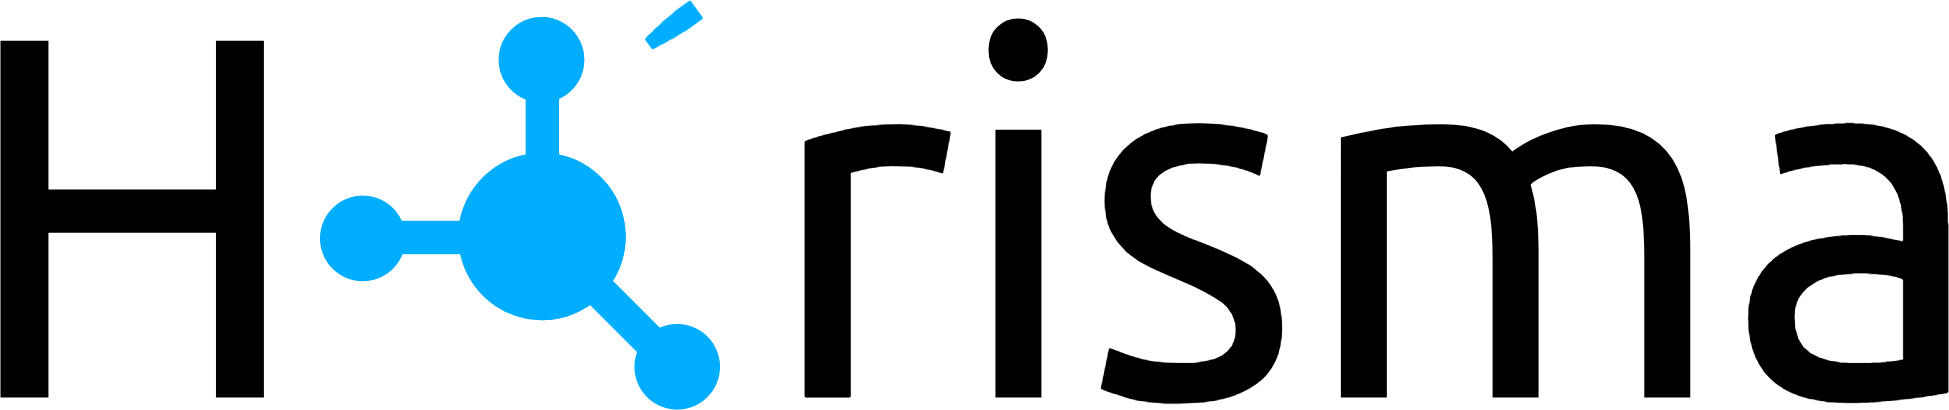 horismalogo2